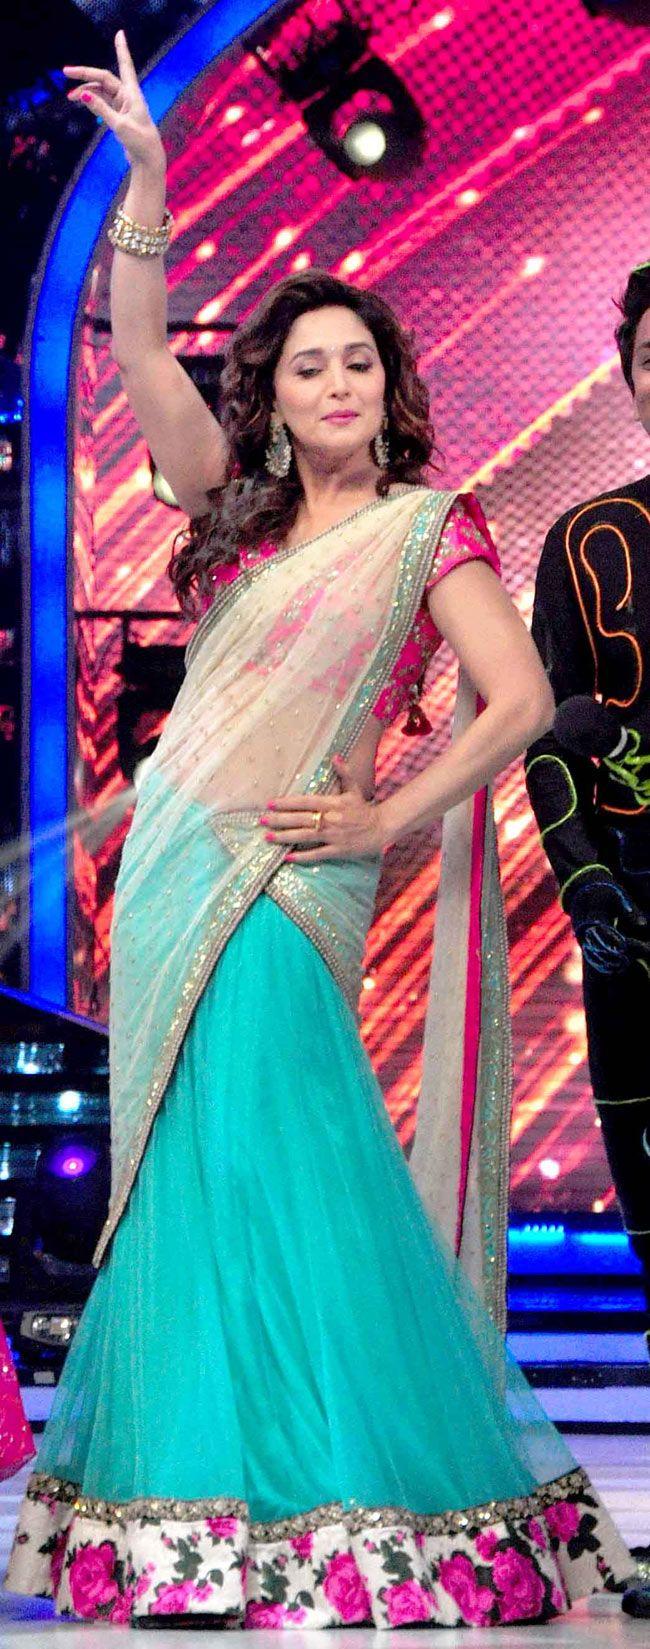 Madhuri Dixit shows off her dance moves on 'Jhalak Dikkhla Jaa'. #Bollywood #Fashion #Style #Beauty